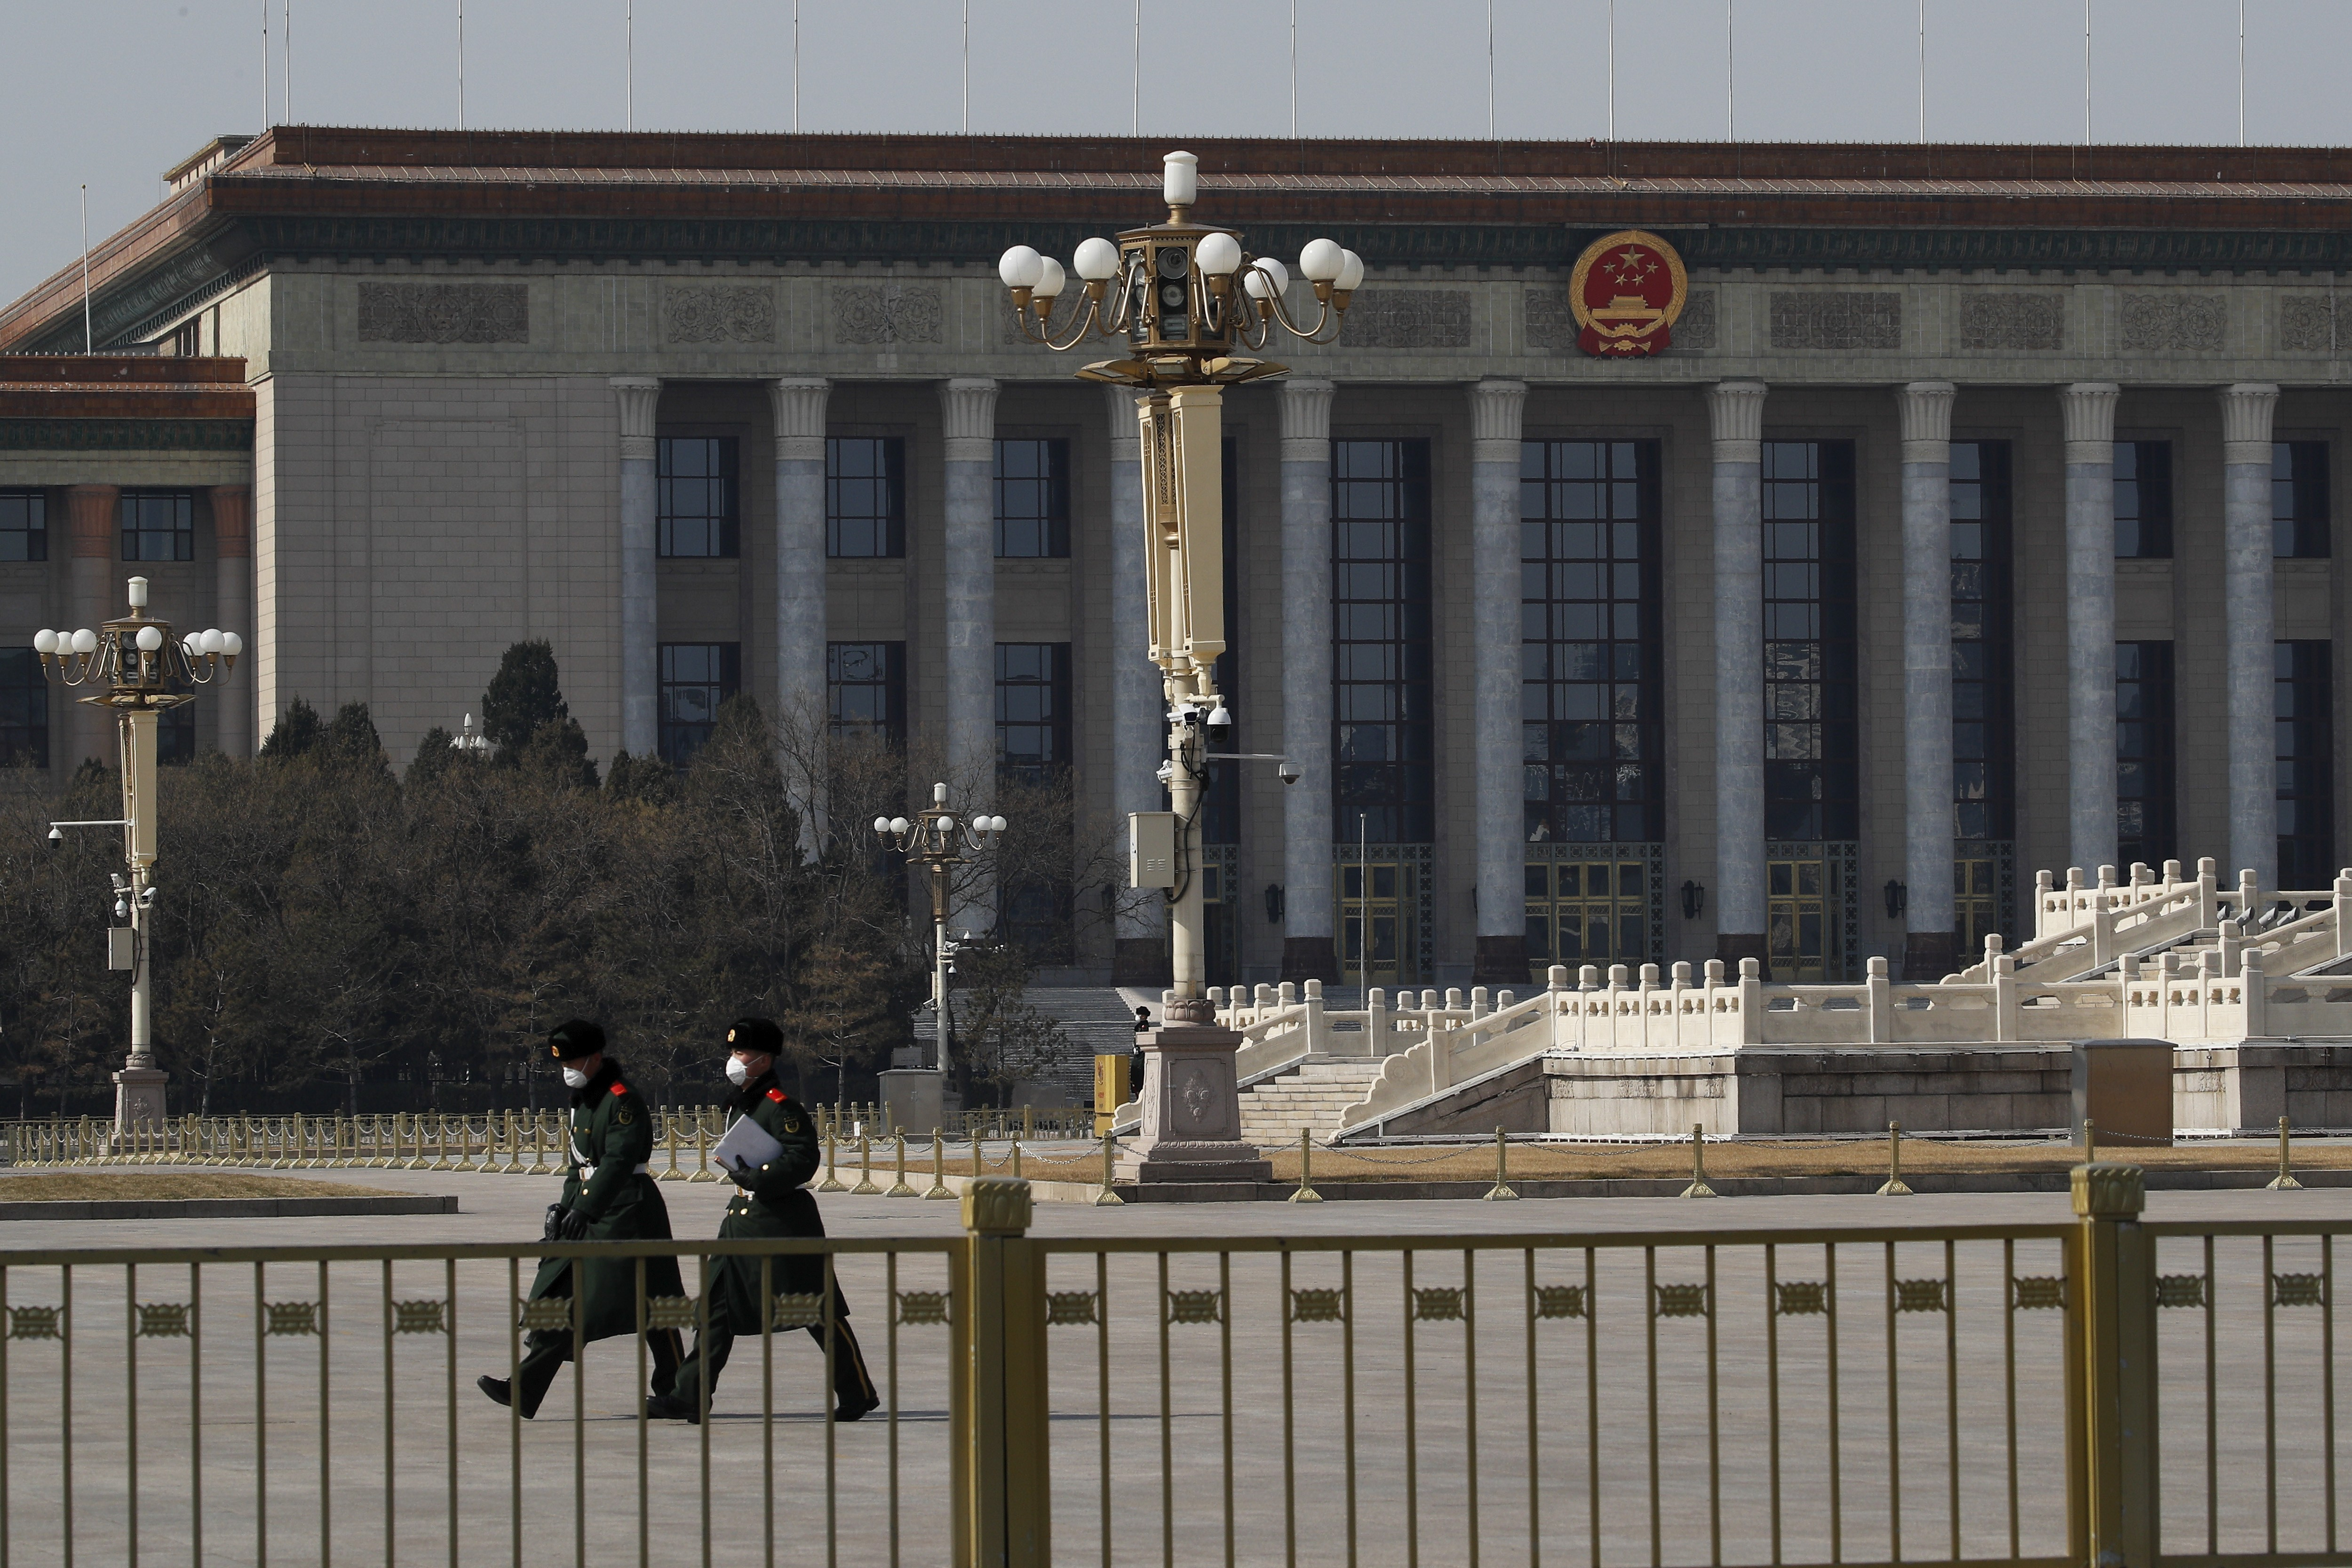 China adia encontro anual do Parlamento devido ao coronavírus